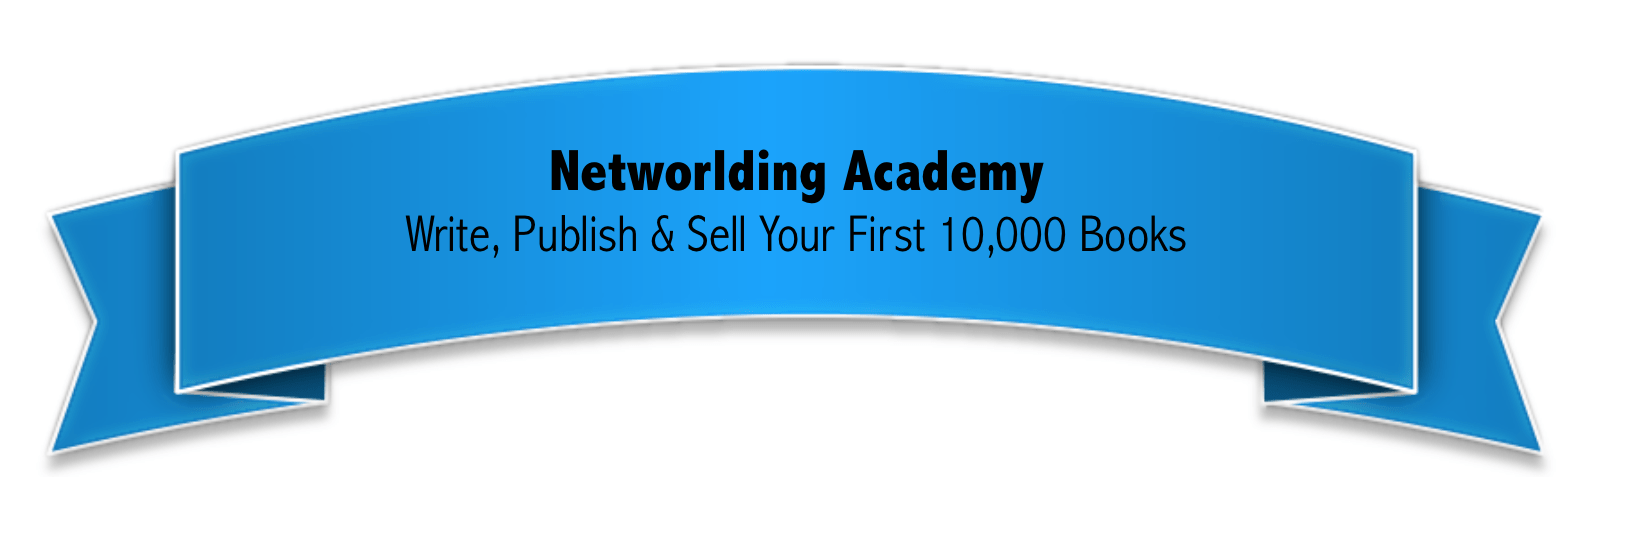 networlding-academy-banner